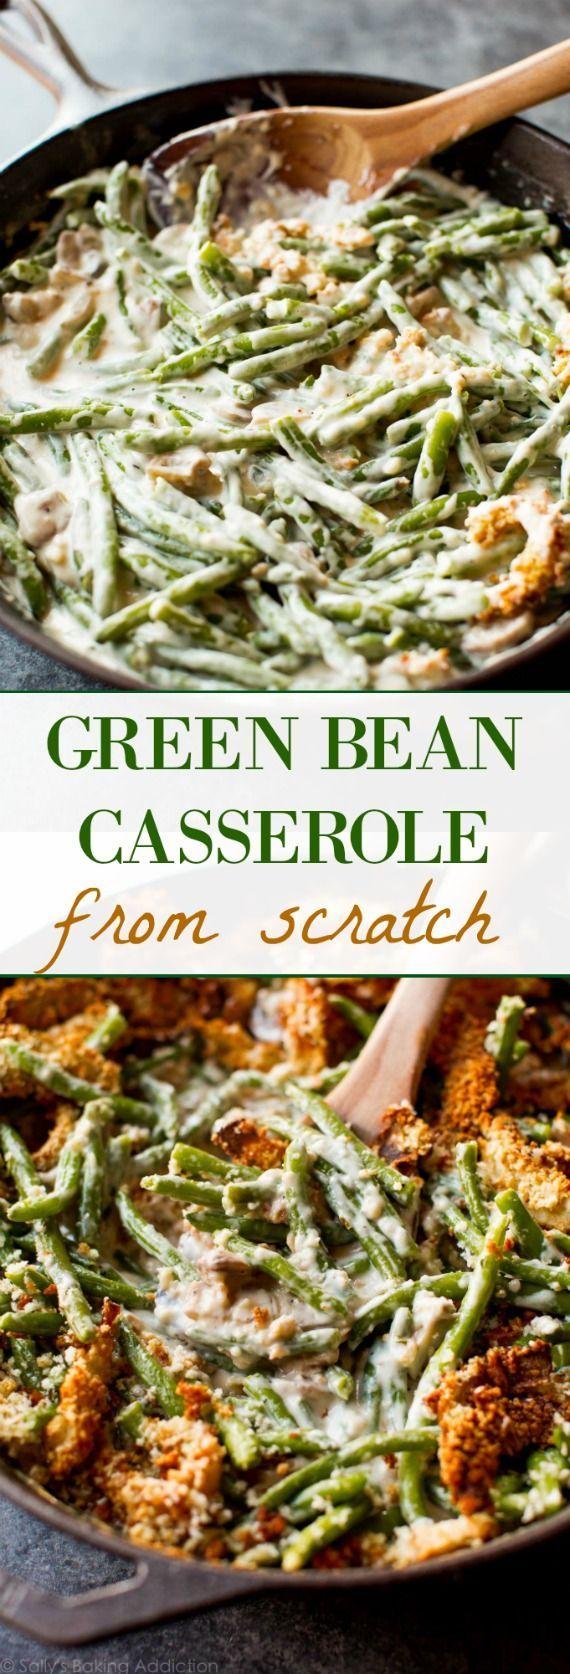 Creamy Green Bean Casserole from Scratch | Sally's Baking Addiction